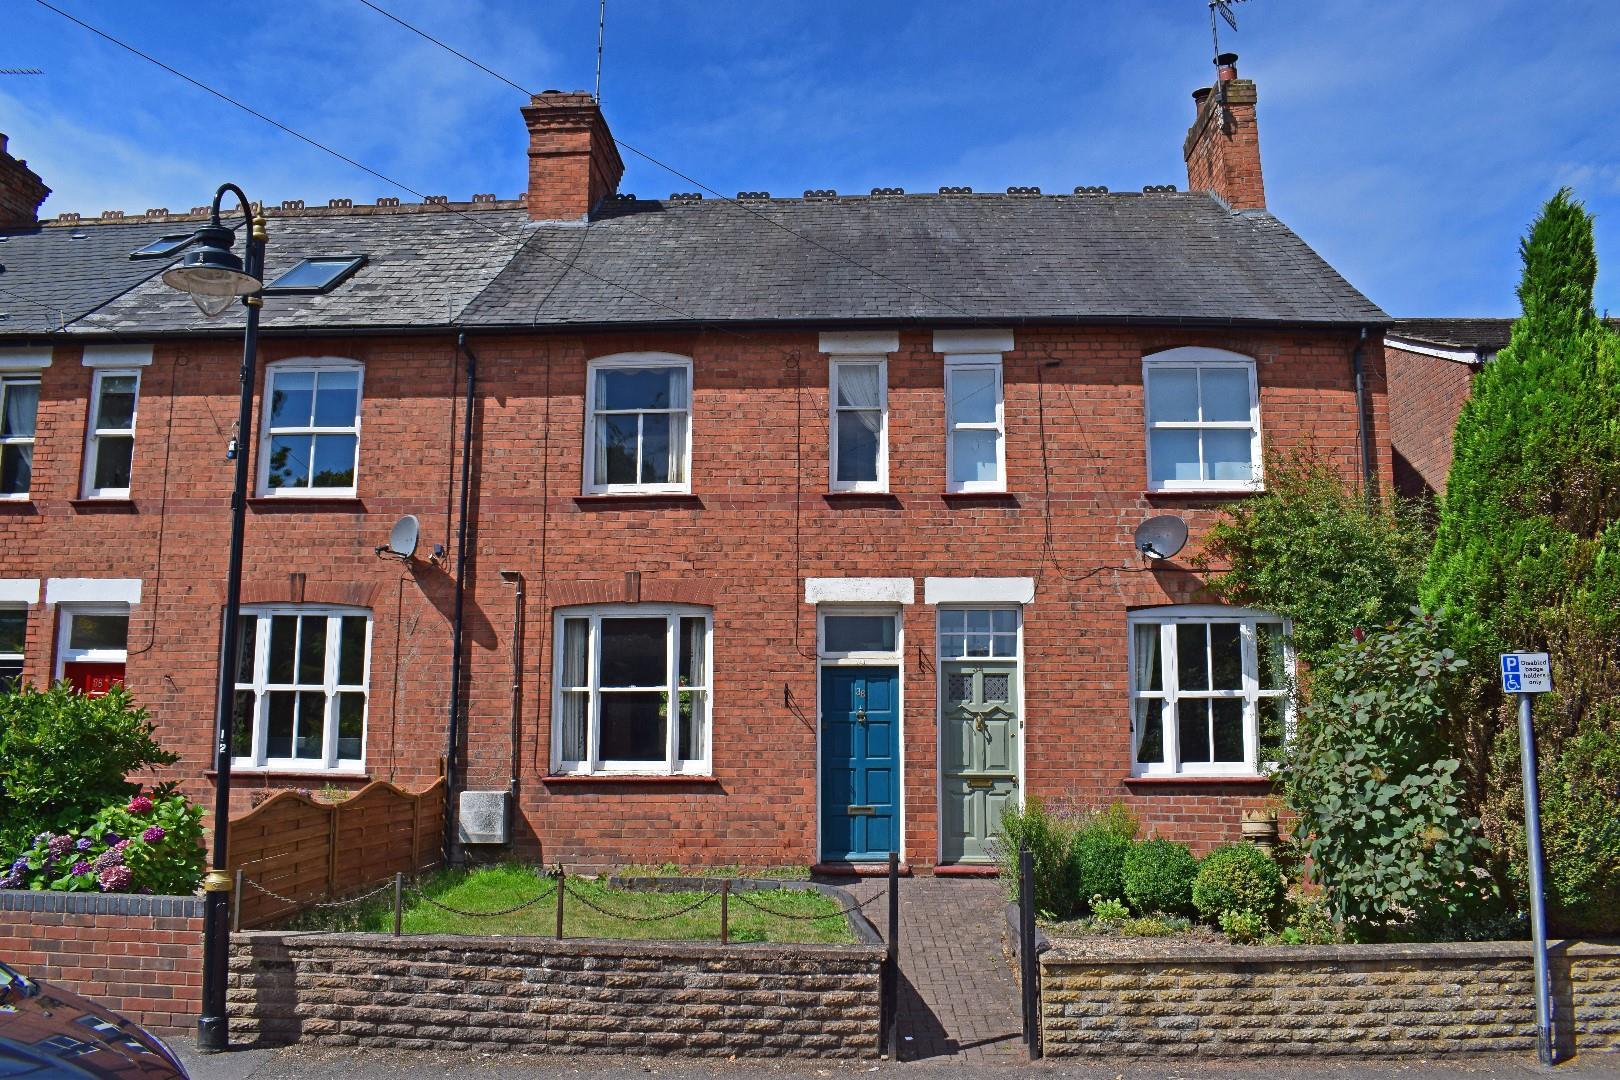 36 Hewell Road, Barnt Green, B45 8NE